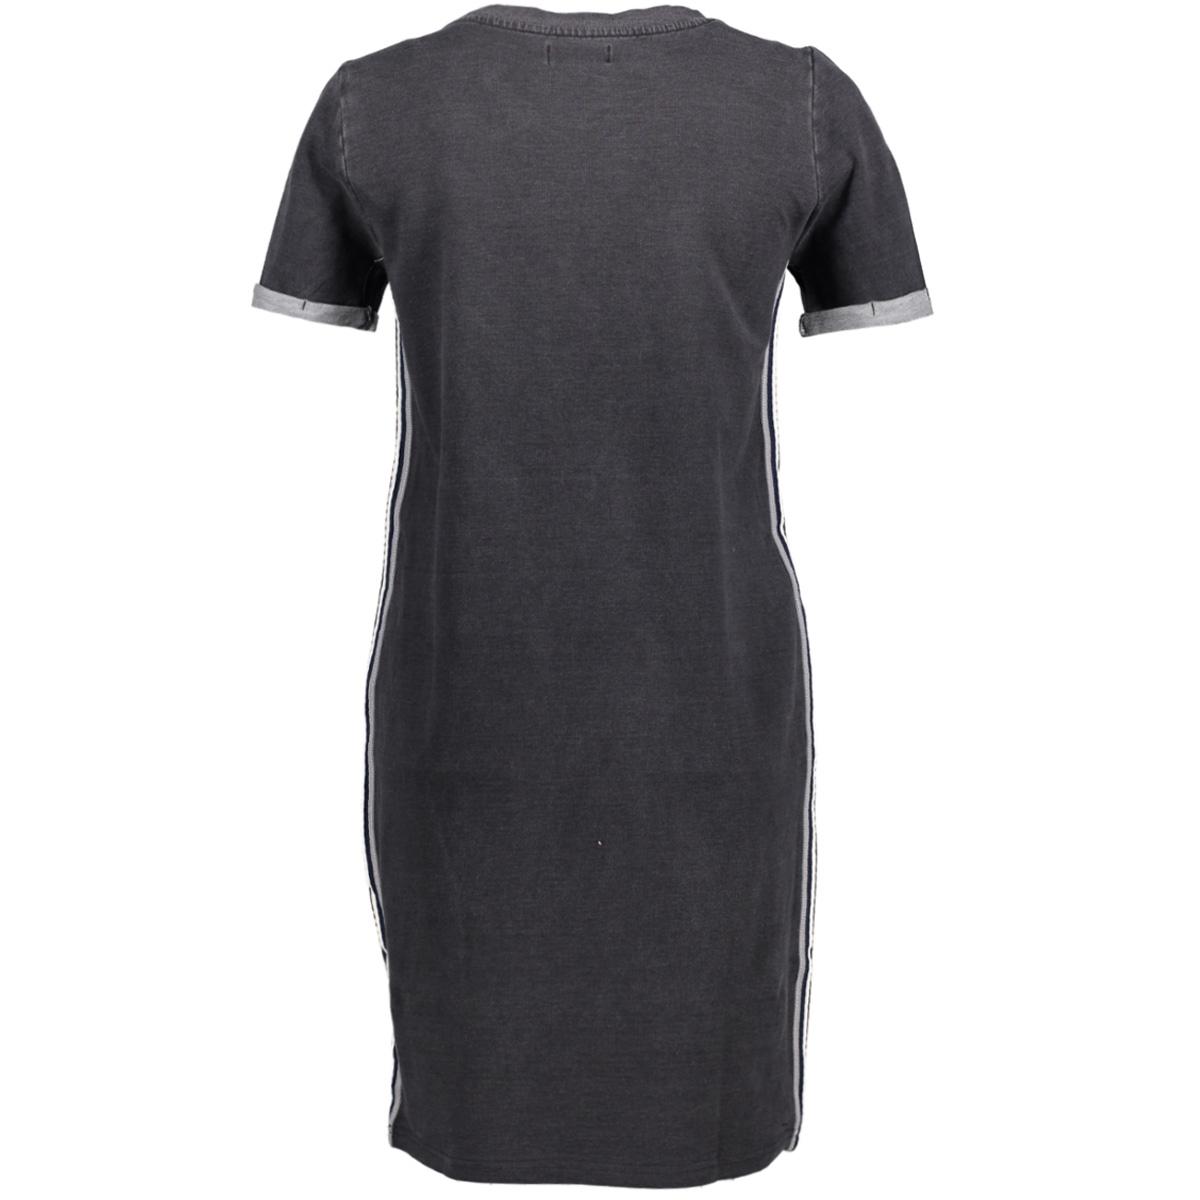 onlcarol s/s dress swt 15135508 only jurk dark grey